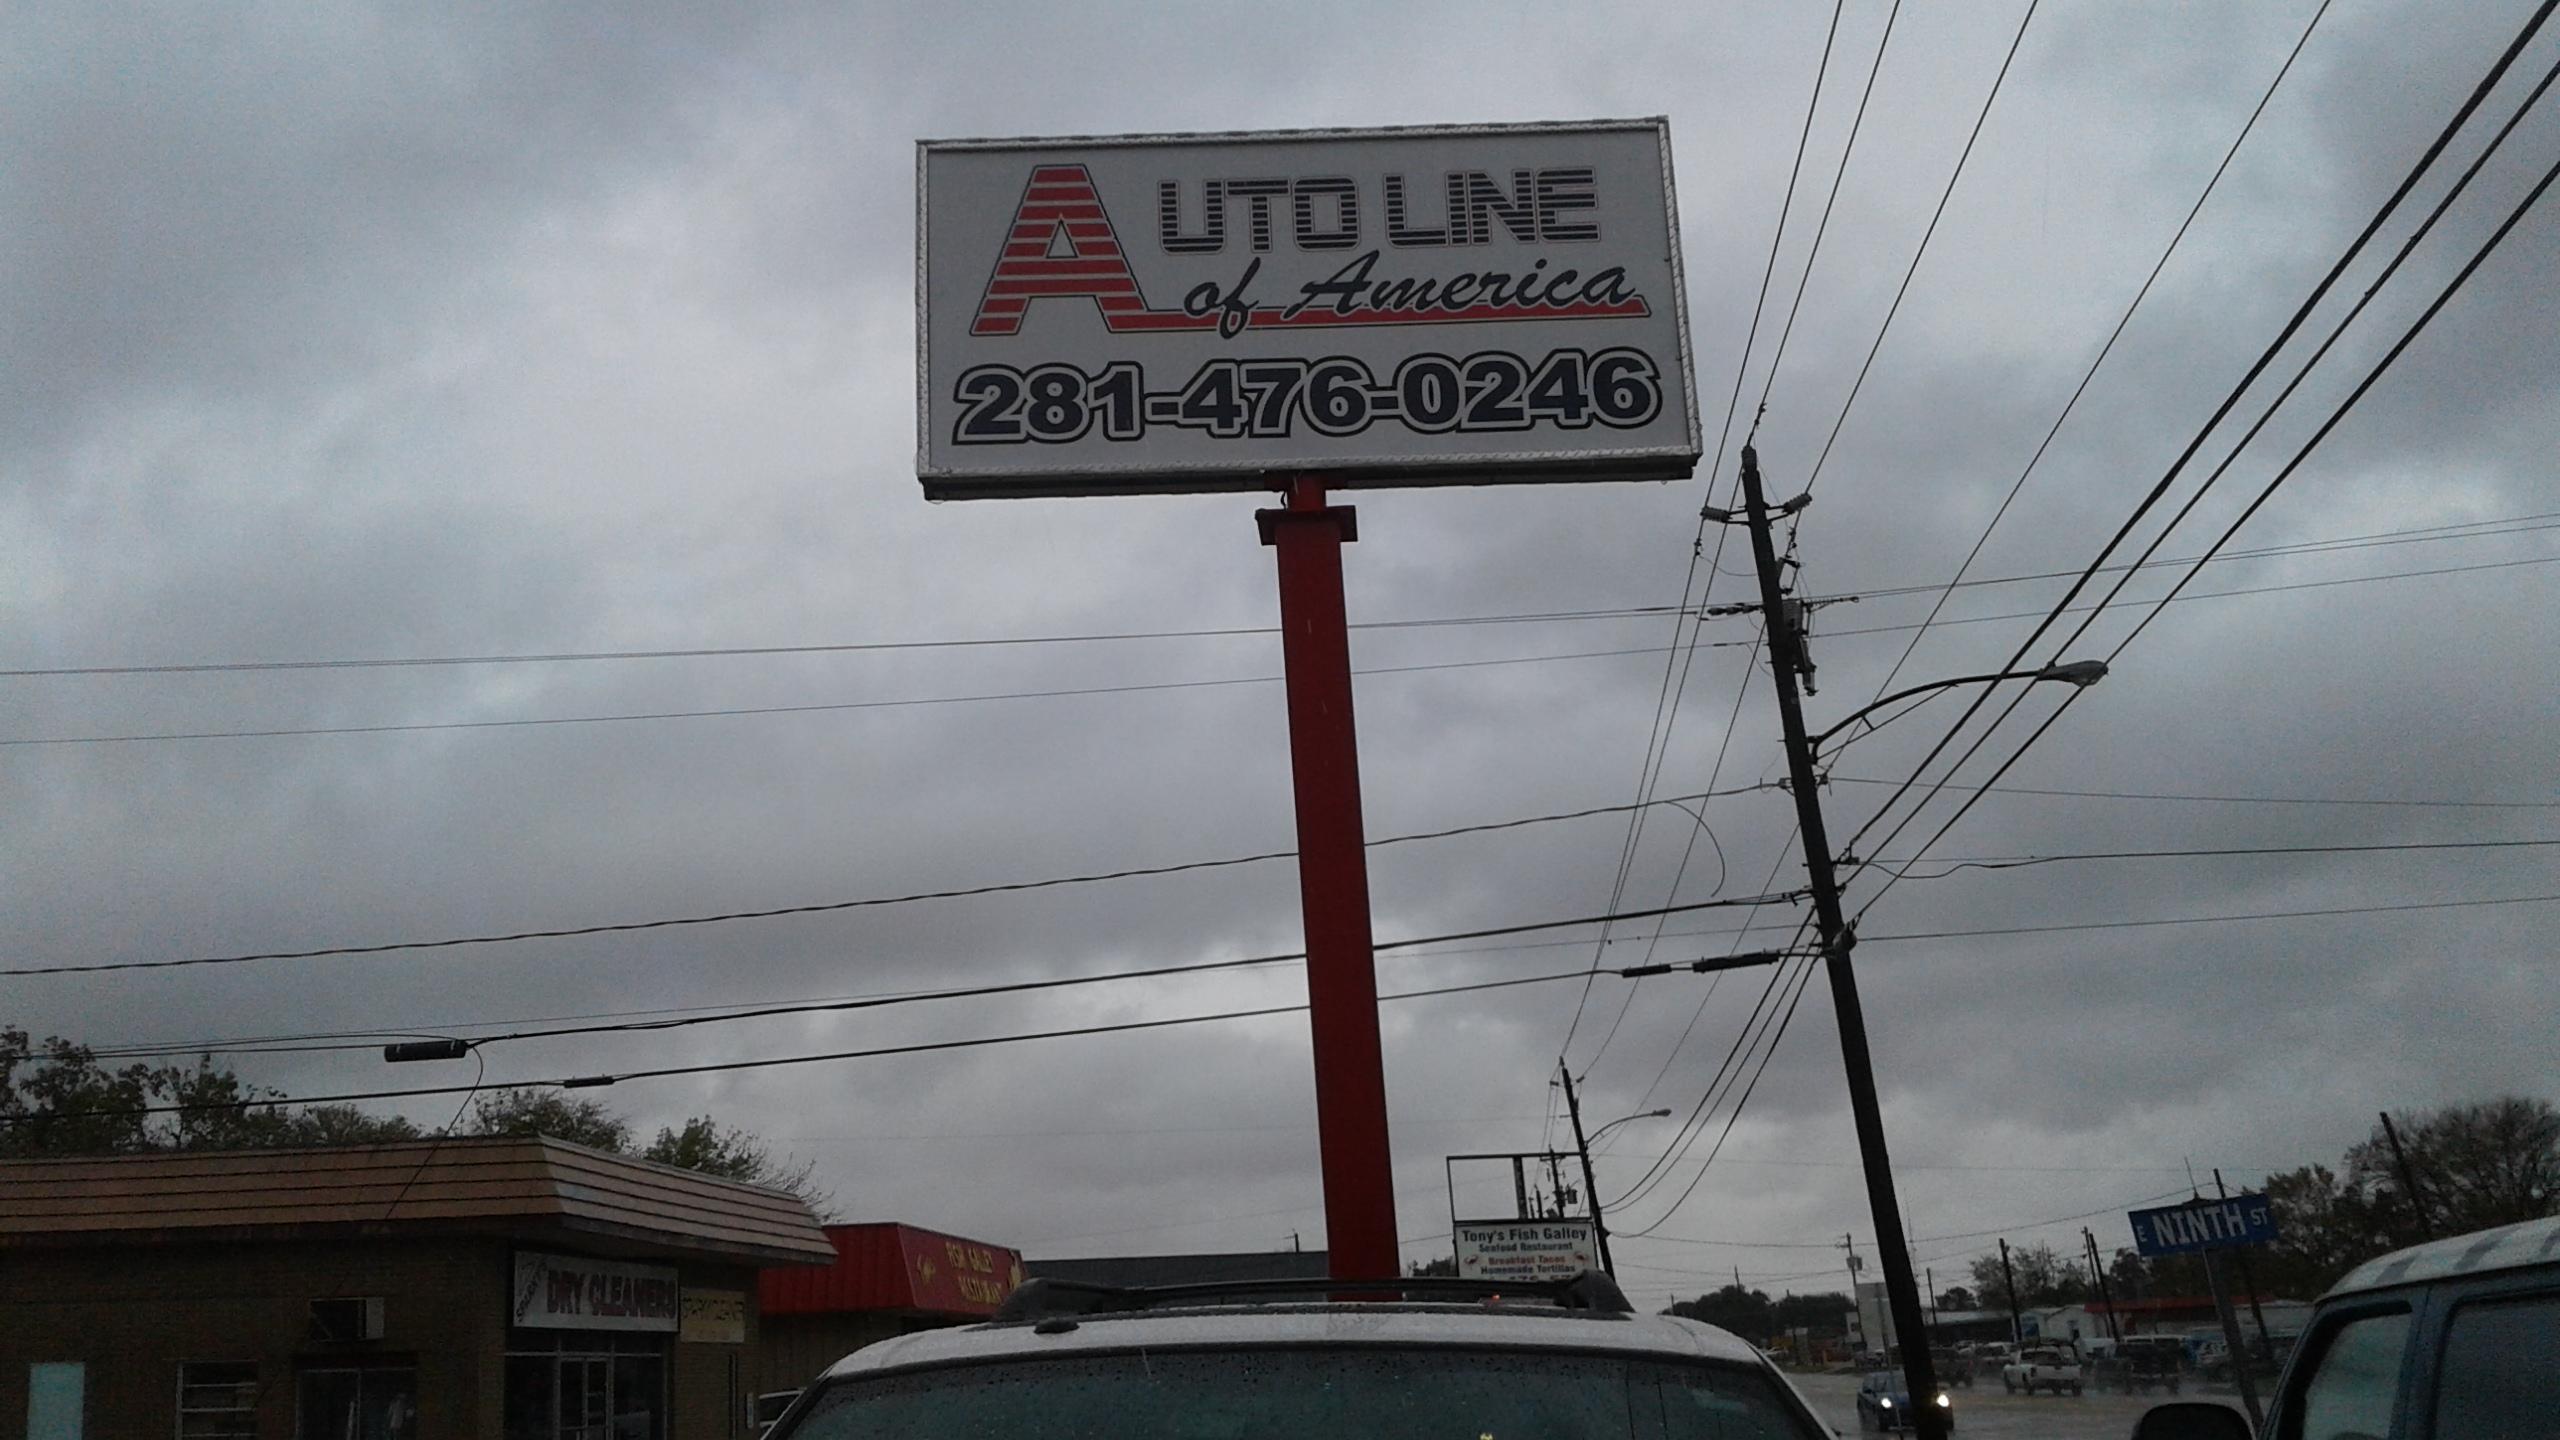 Auto Line of America image 8